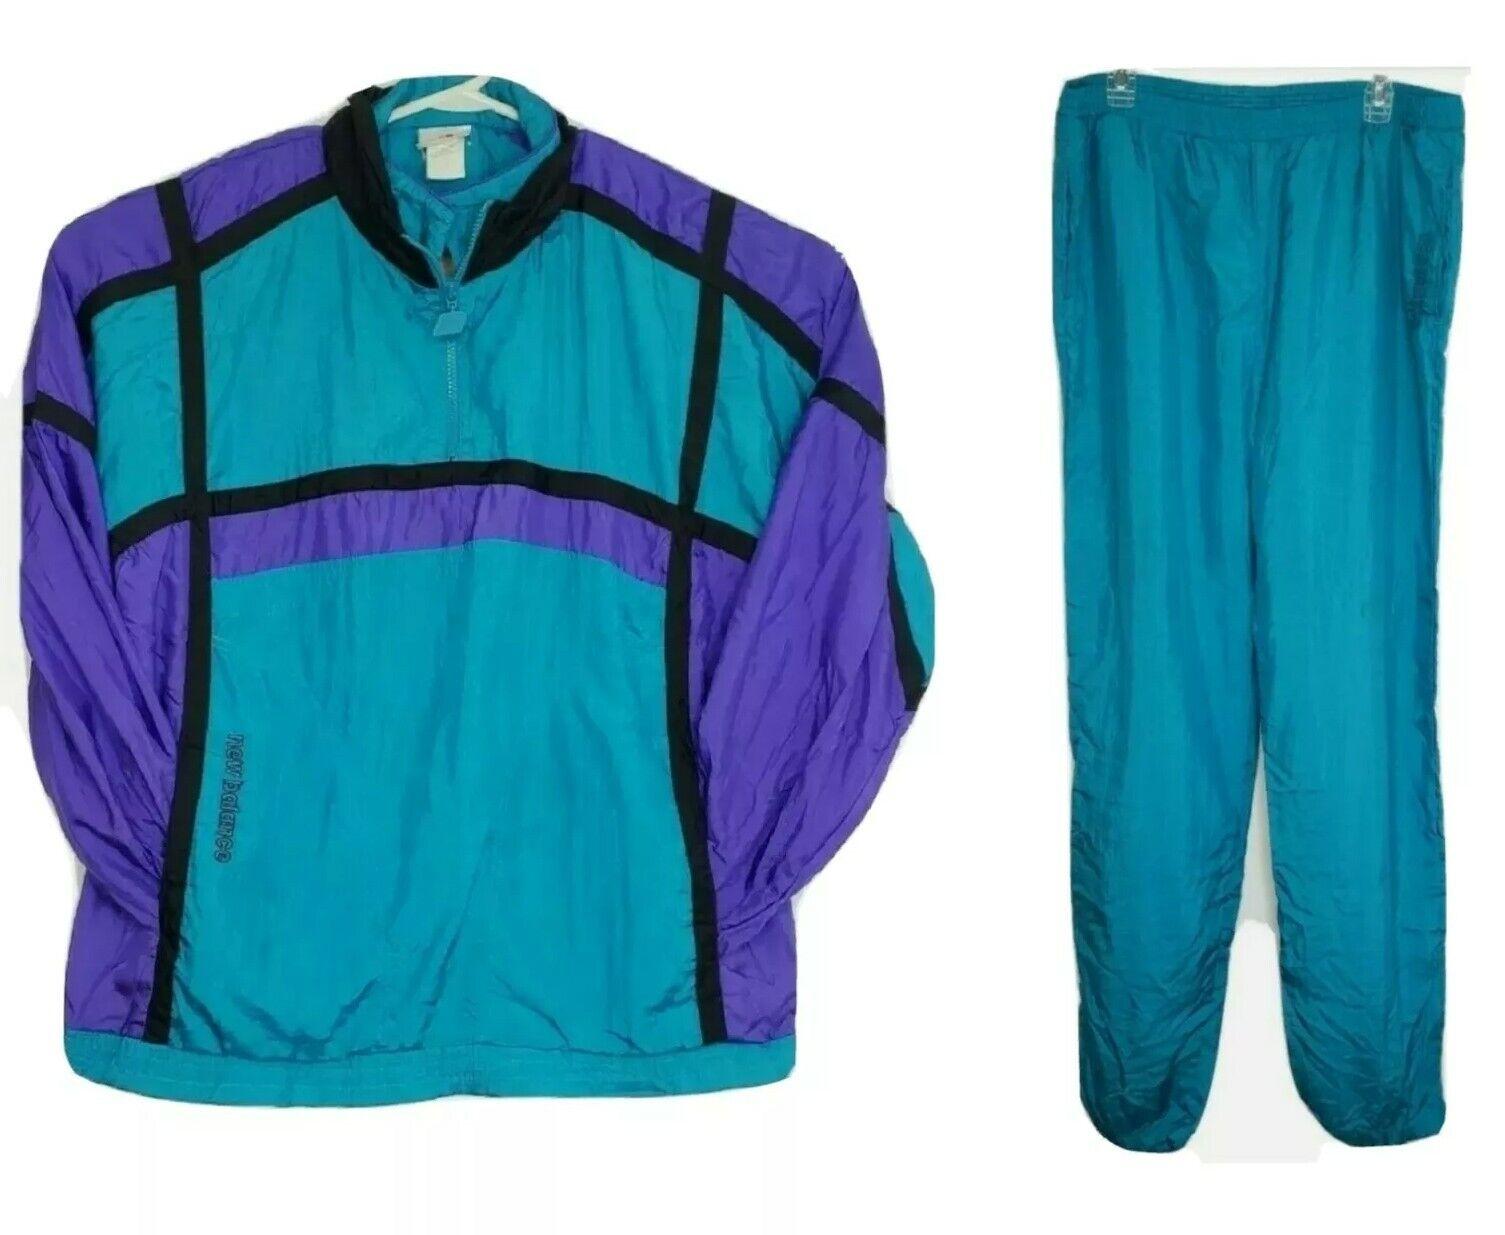 Vintage New Balance Womens Large Track Suit Jacket Pants Teal Purple Colorblock